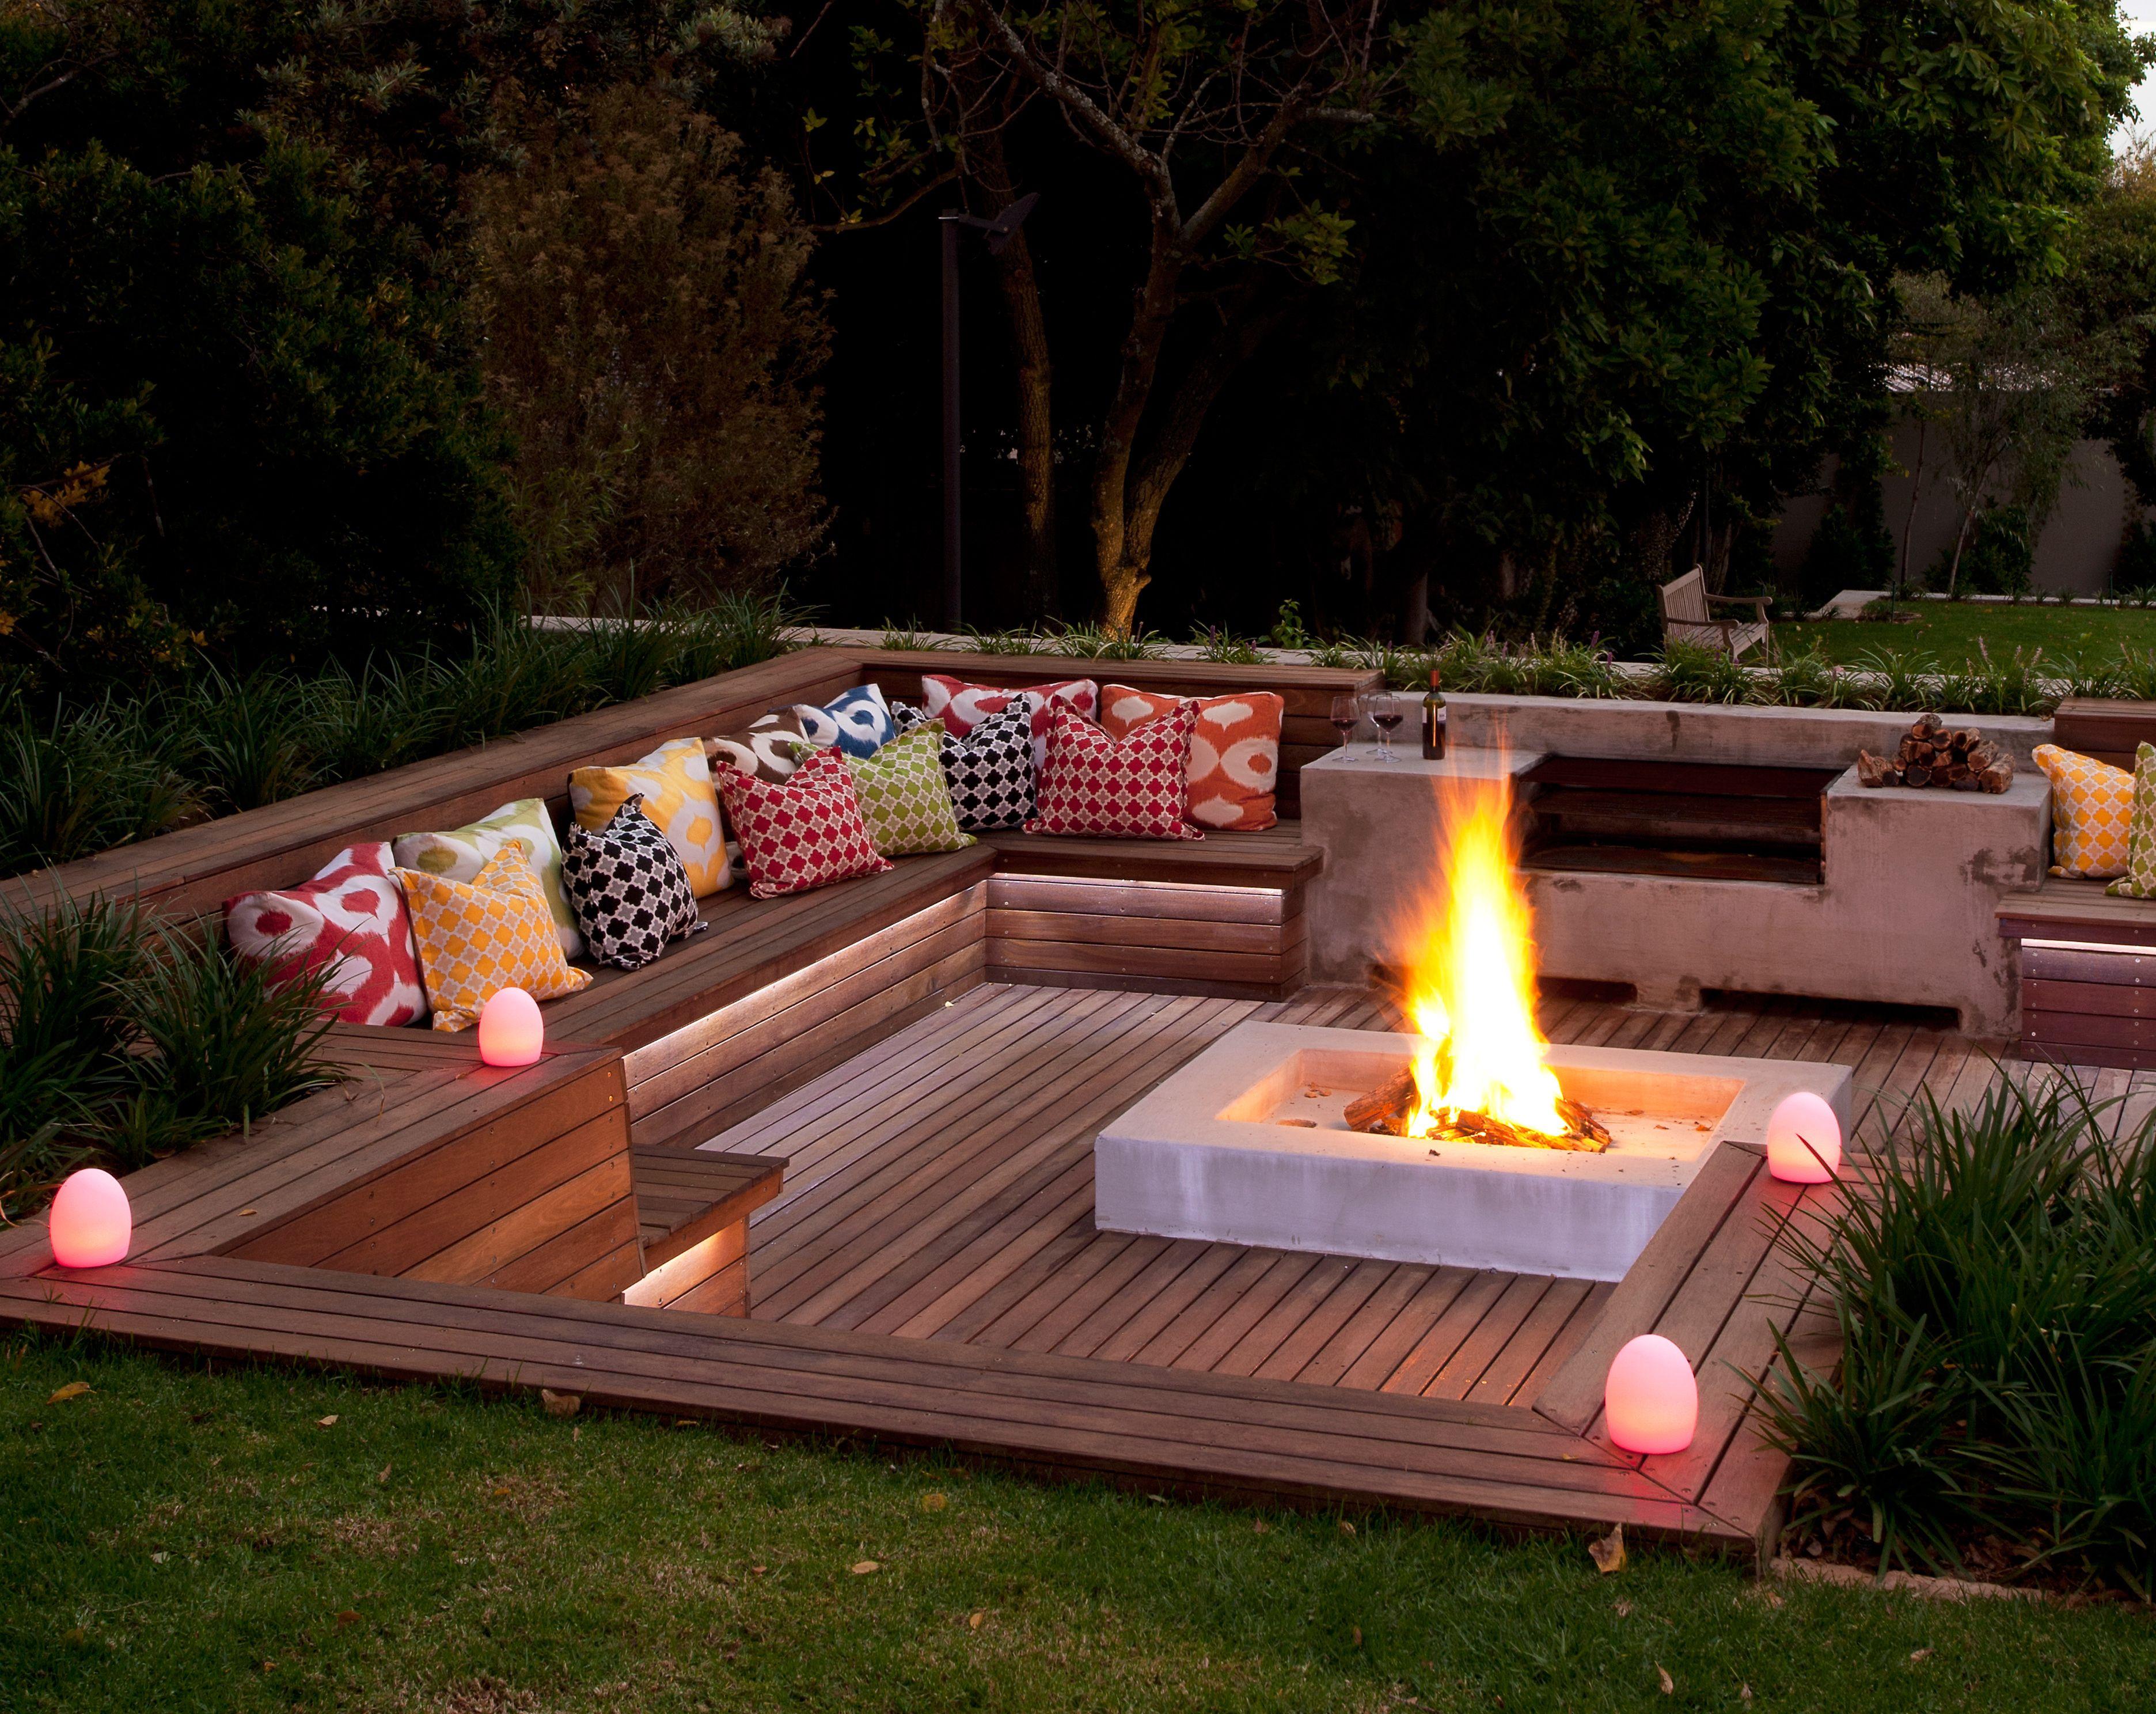 boma design idea ideas for the house pinterest backyard